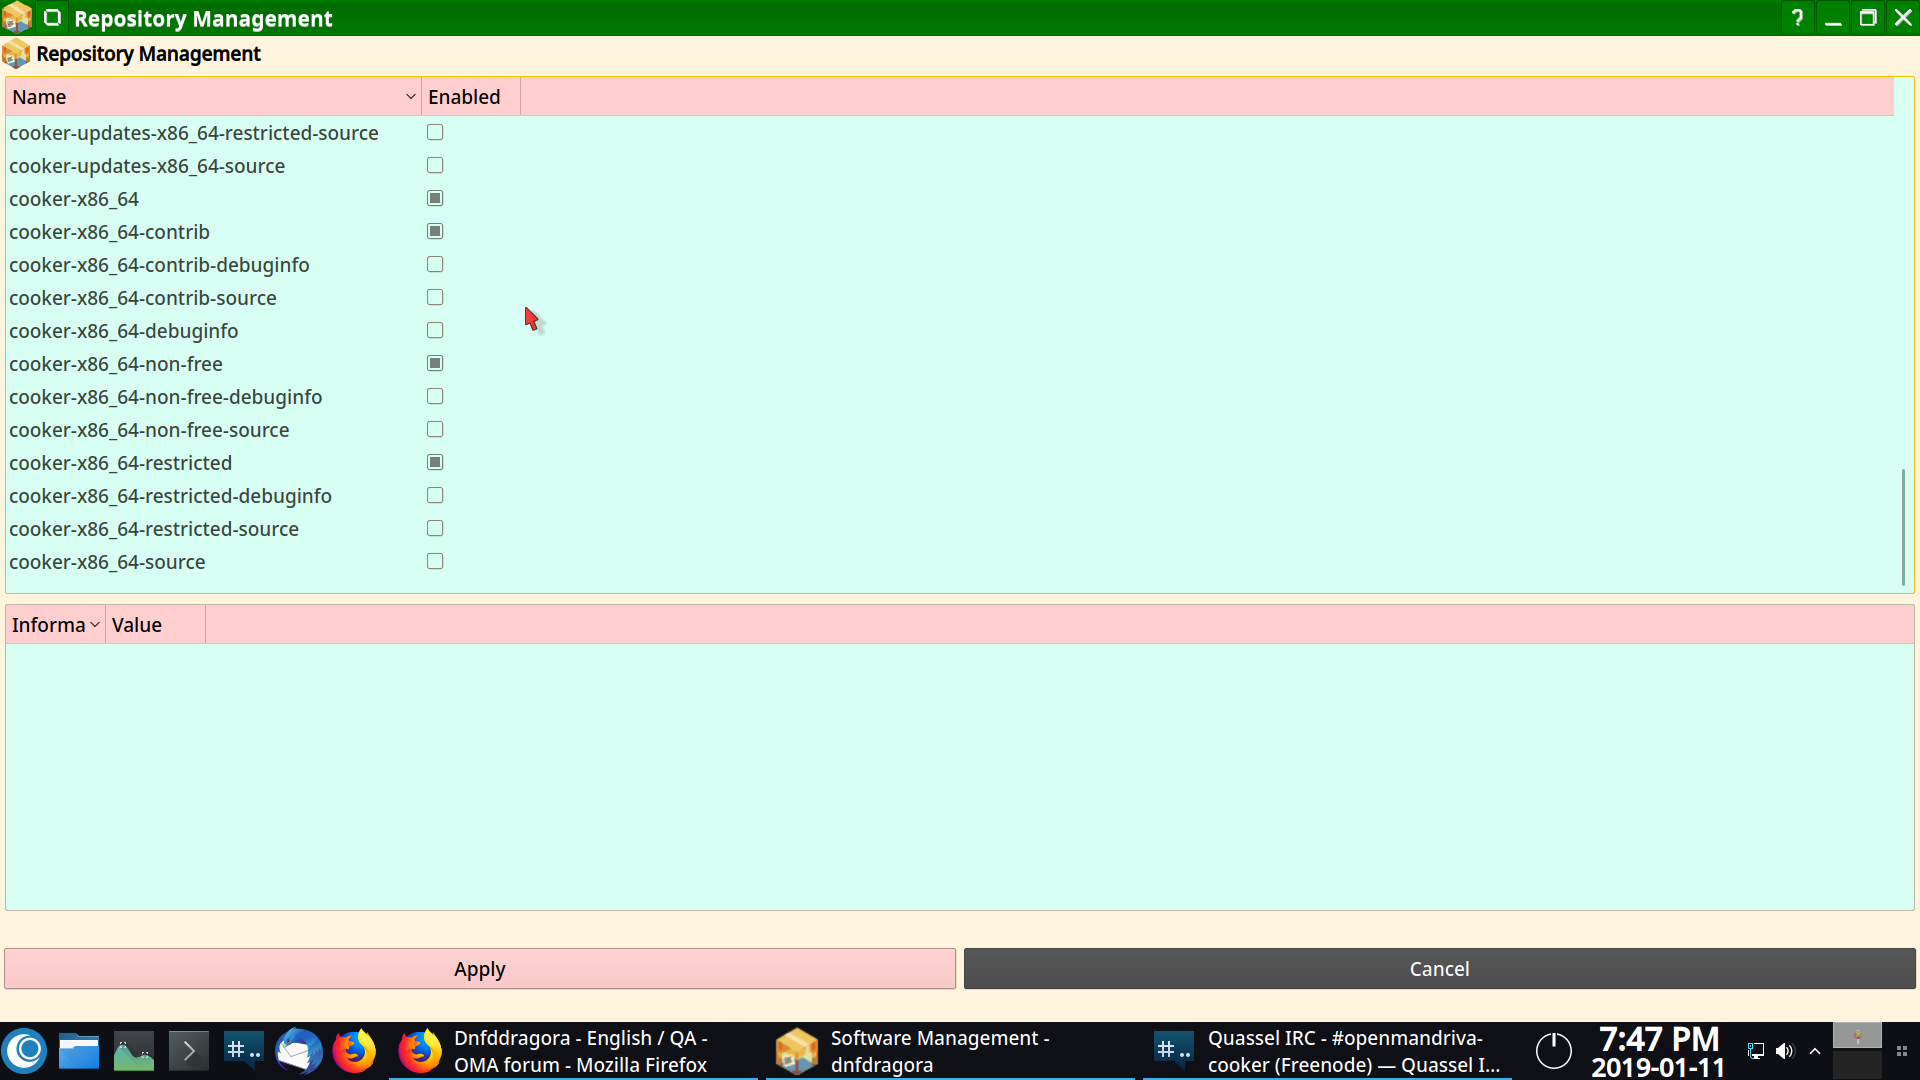 Screenshot_20190111_194731